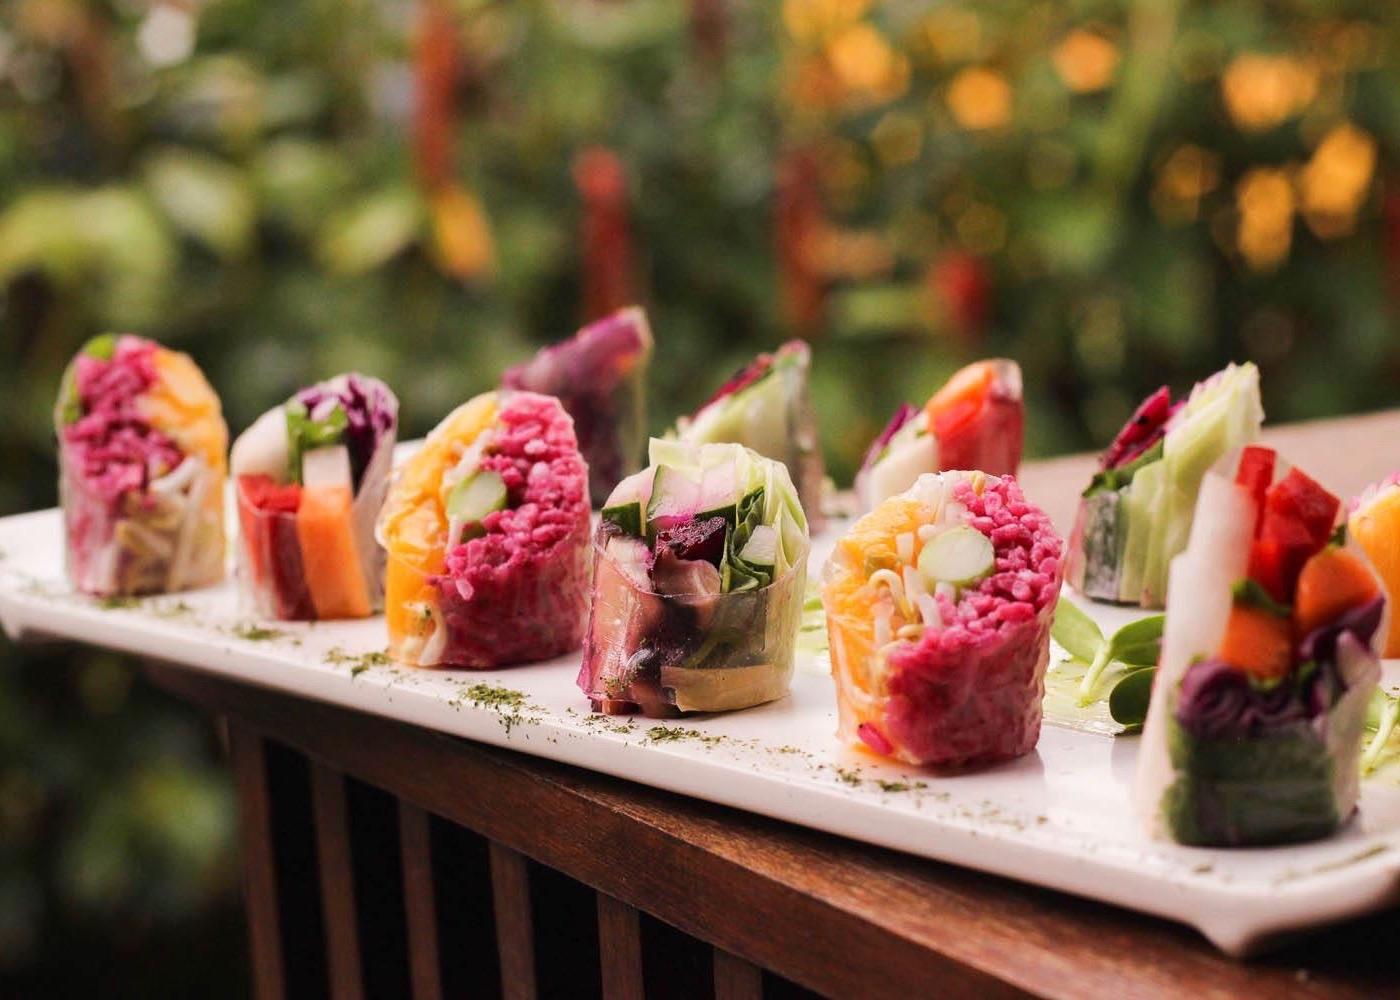 Raw Sushi at Beach Garden Organic Kitchen in Canggu, Bali, Indonesia